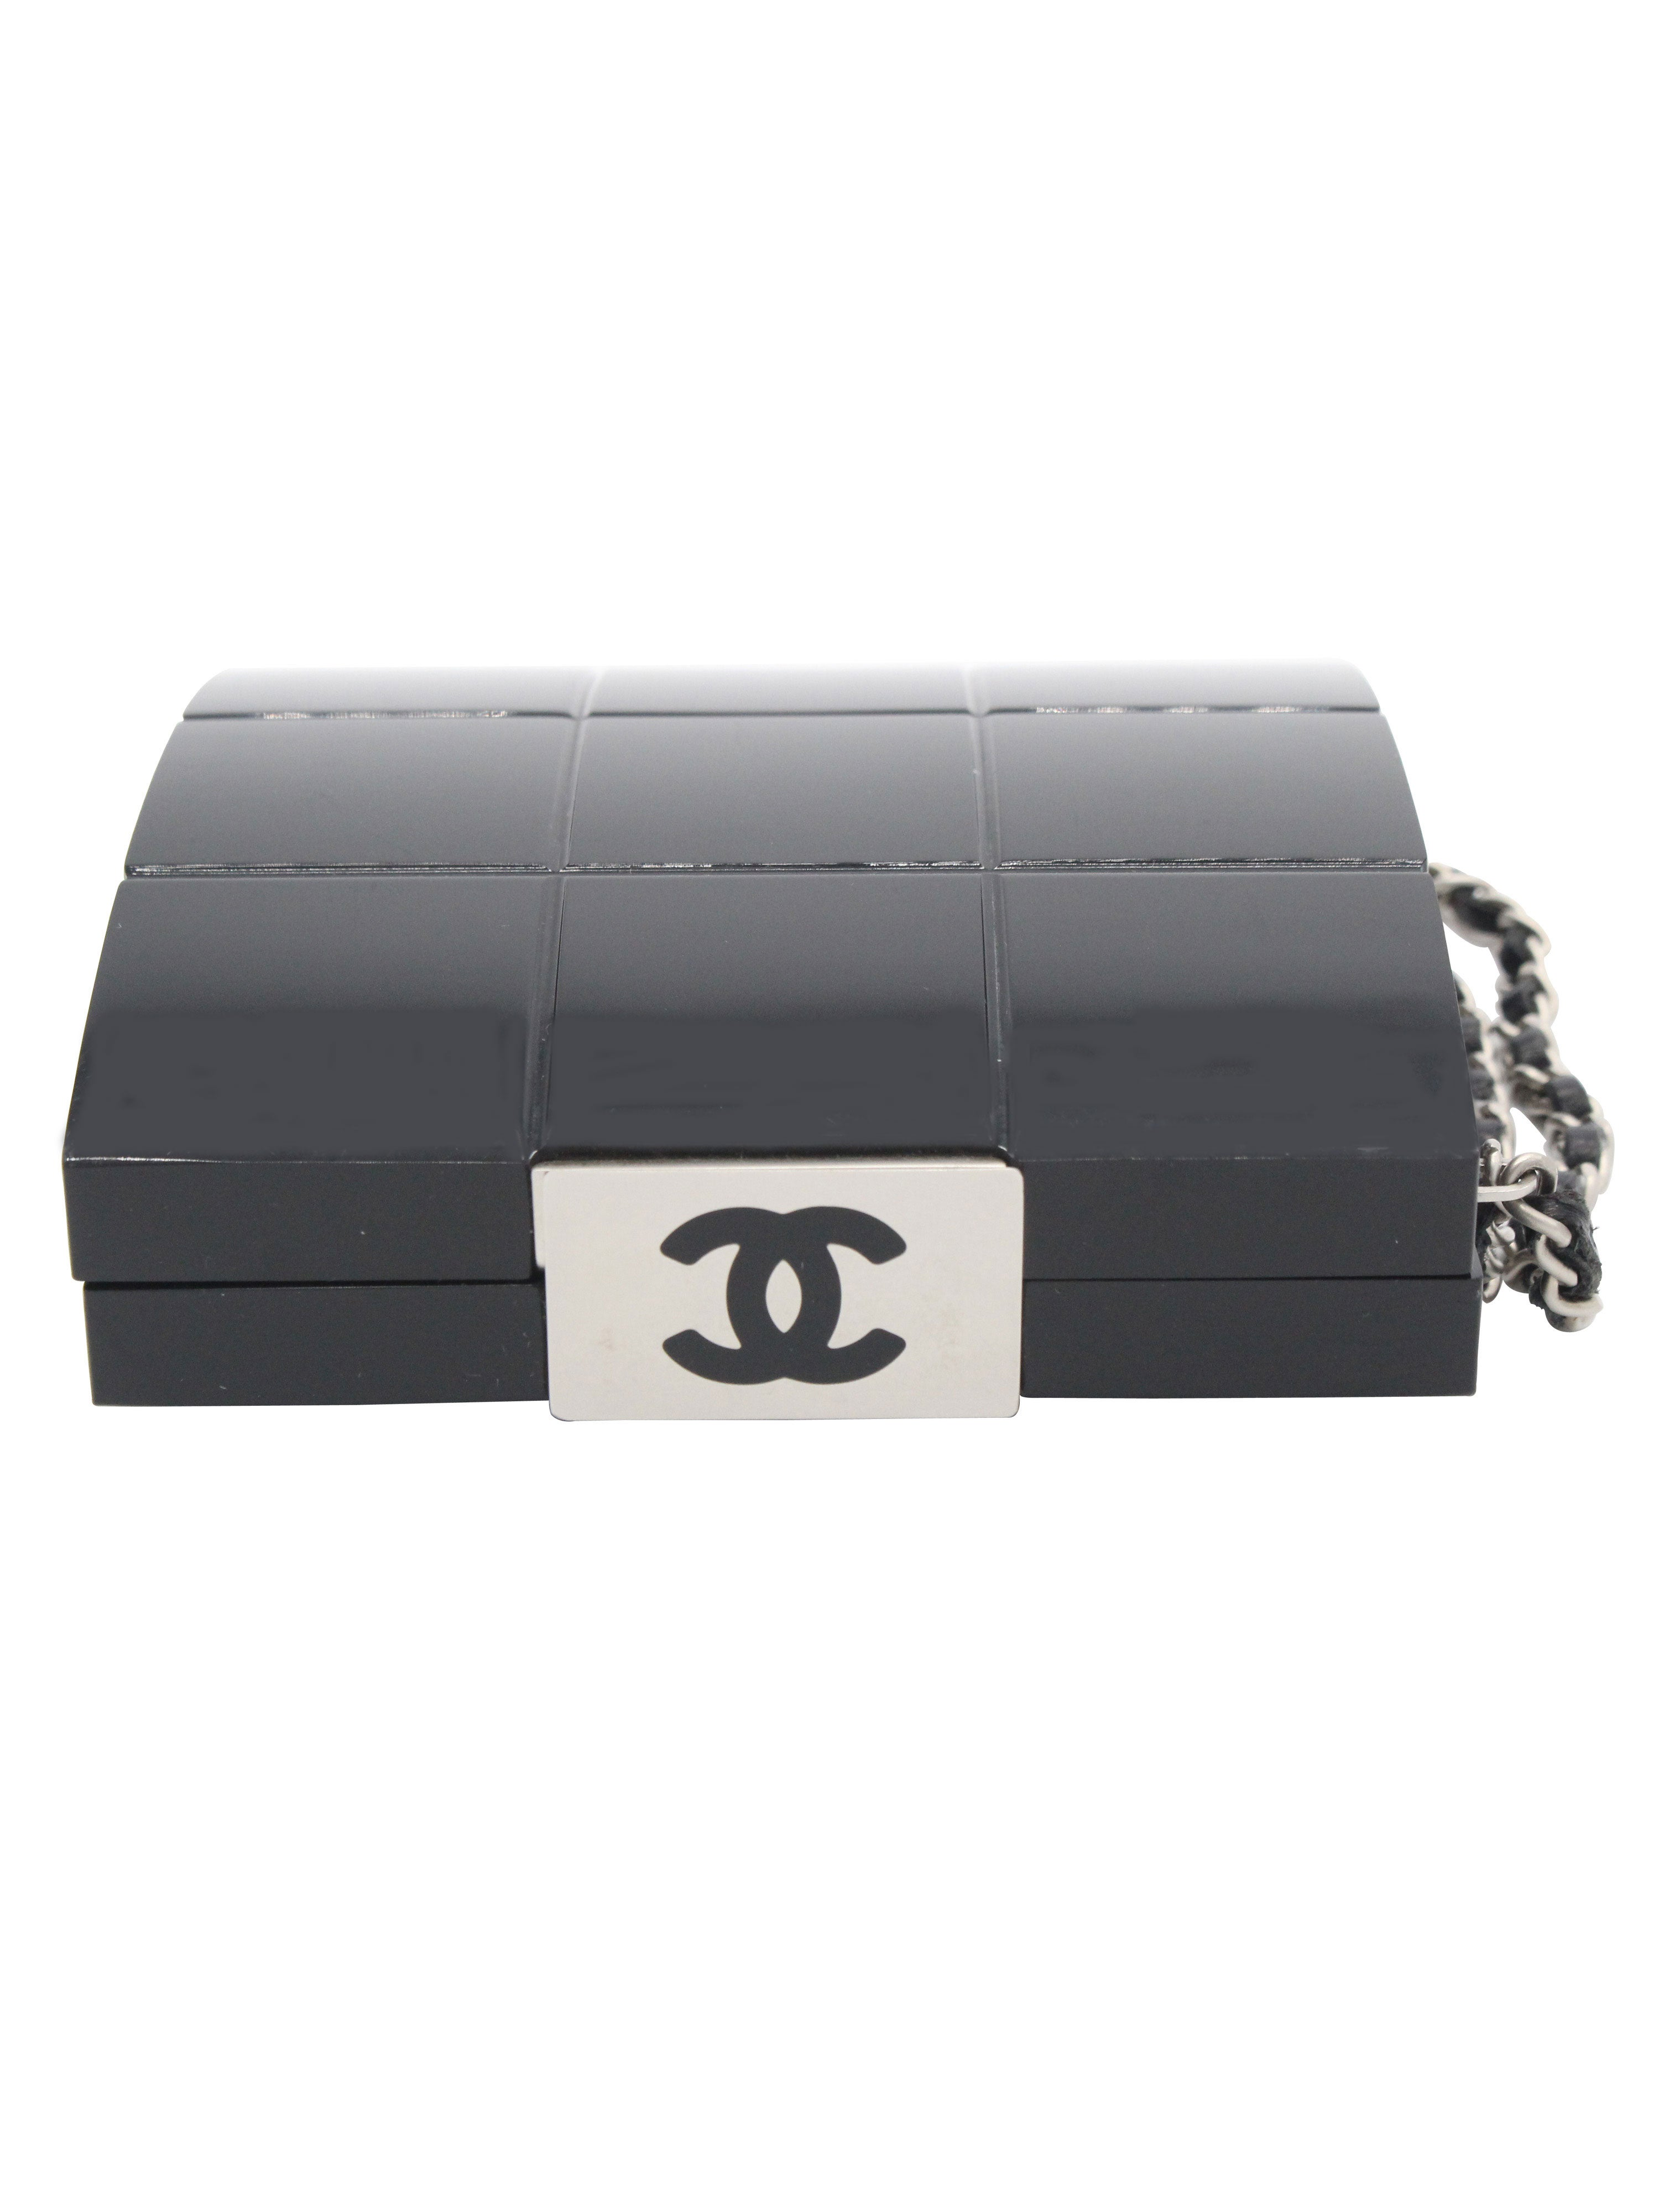 Chanel Black Perspex Lucite Minaudiere Clutch / Chain Wristlet Collectors